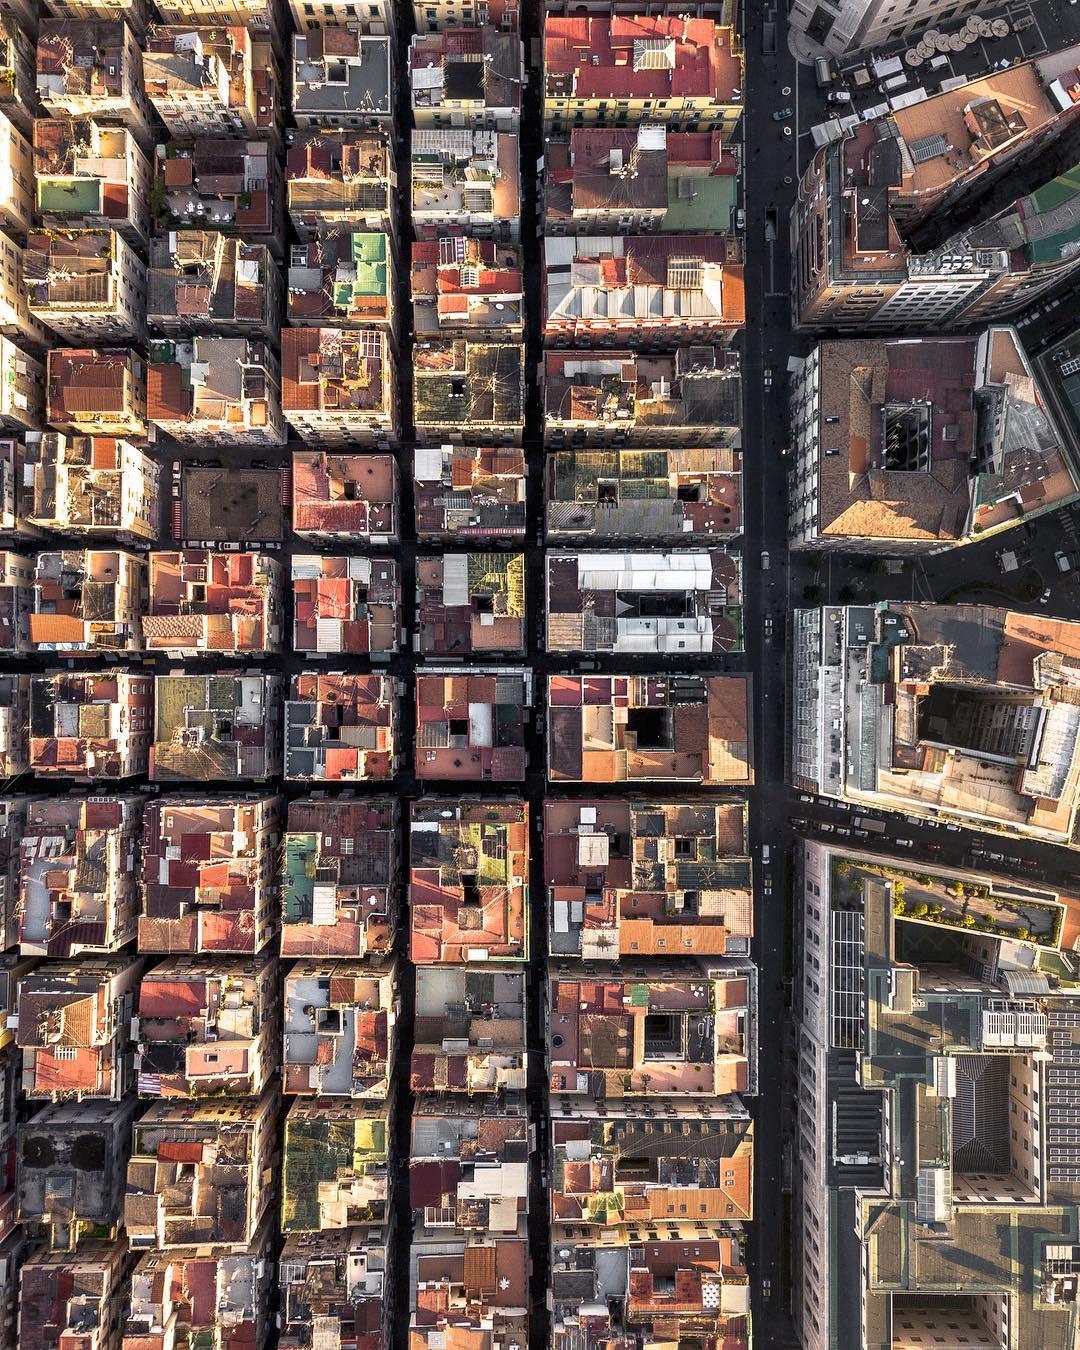 Италия сверху: дрон-фотографии от Марко Гизетти